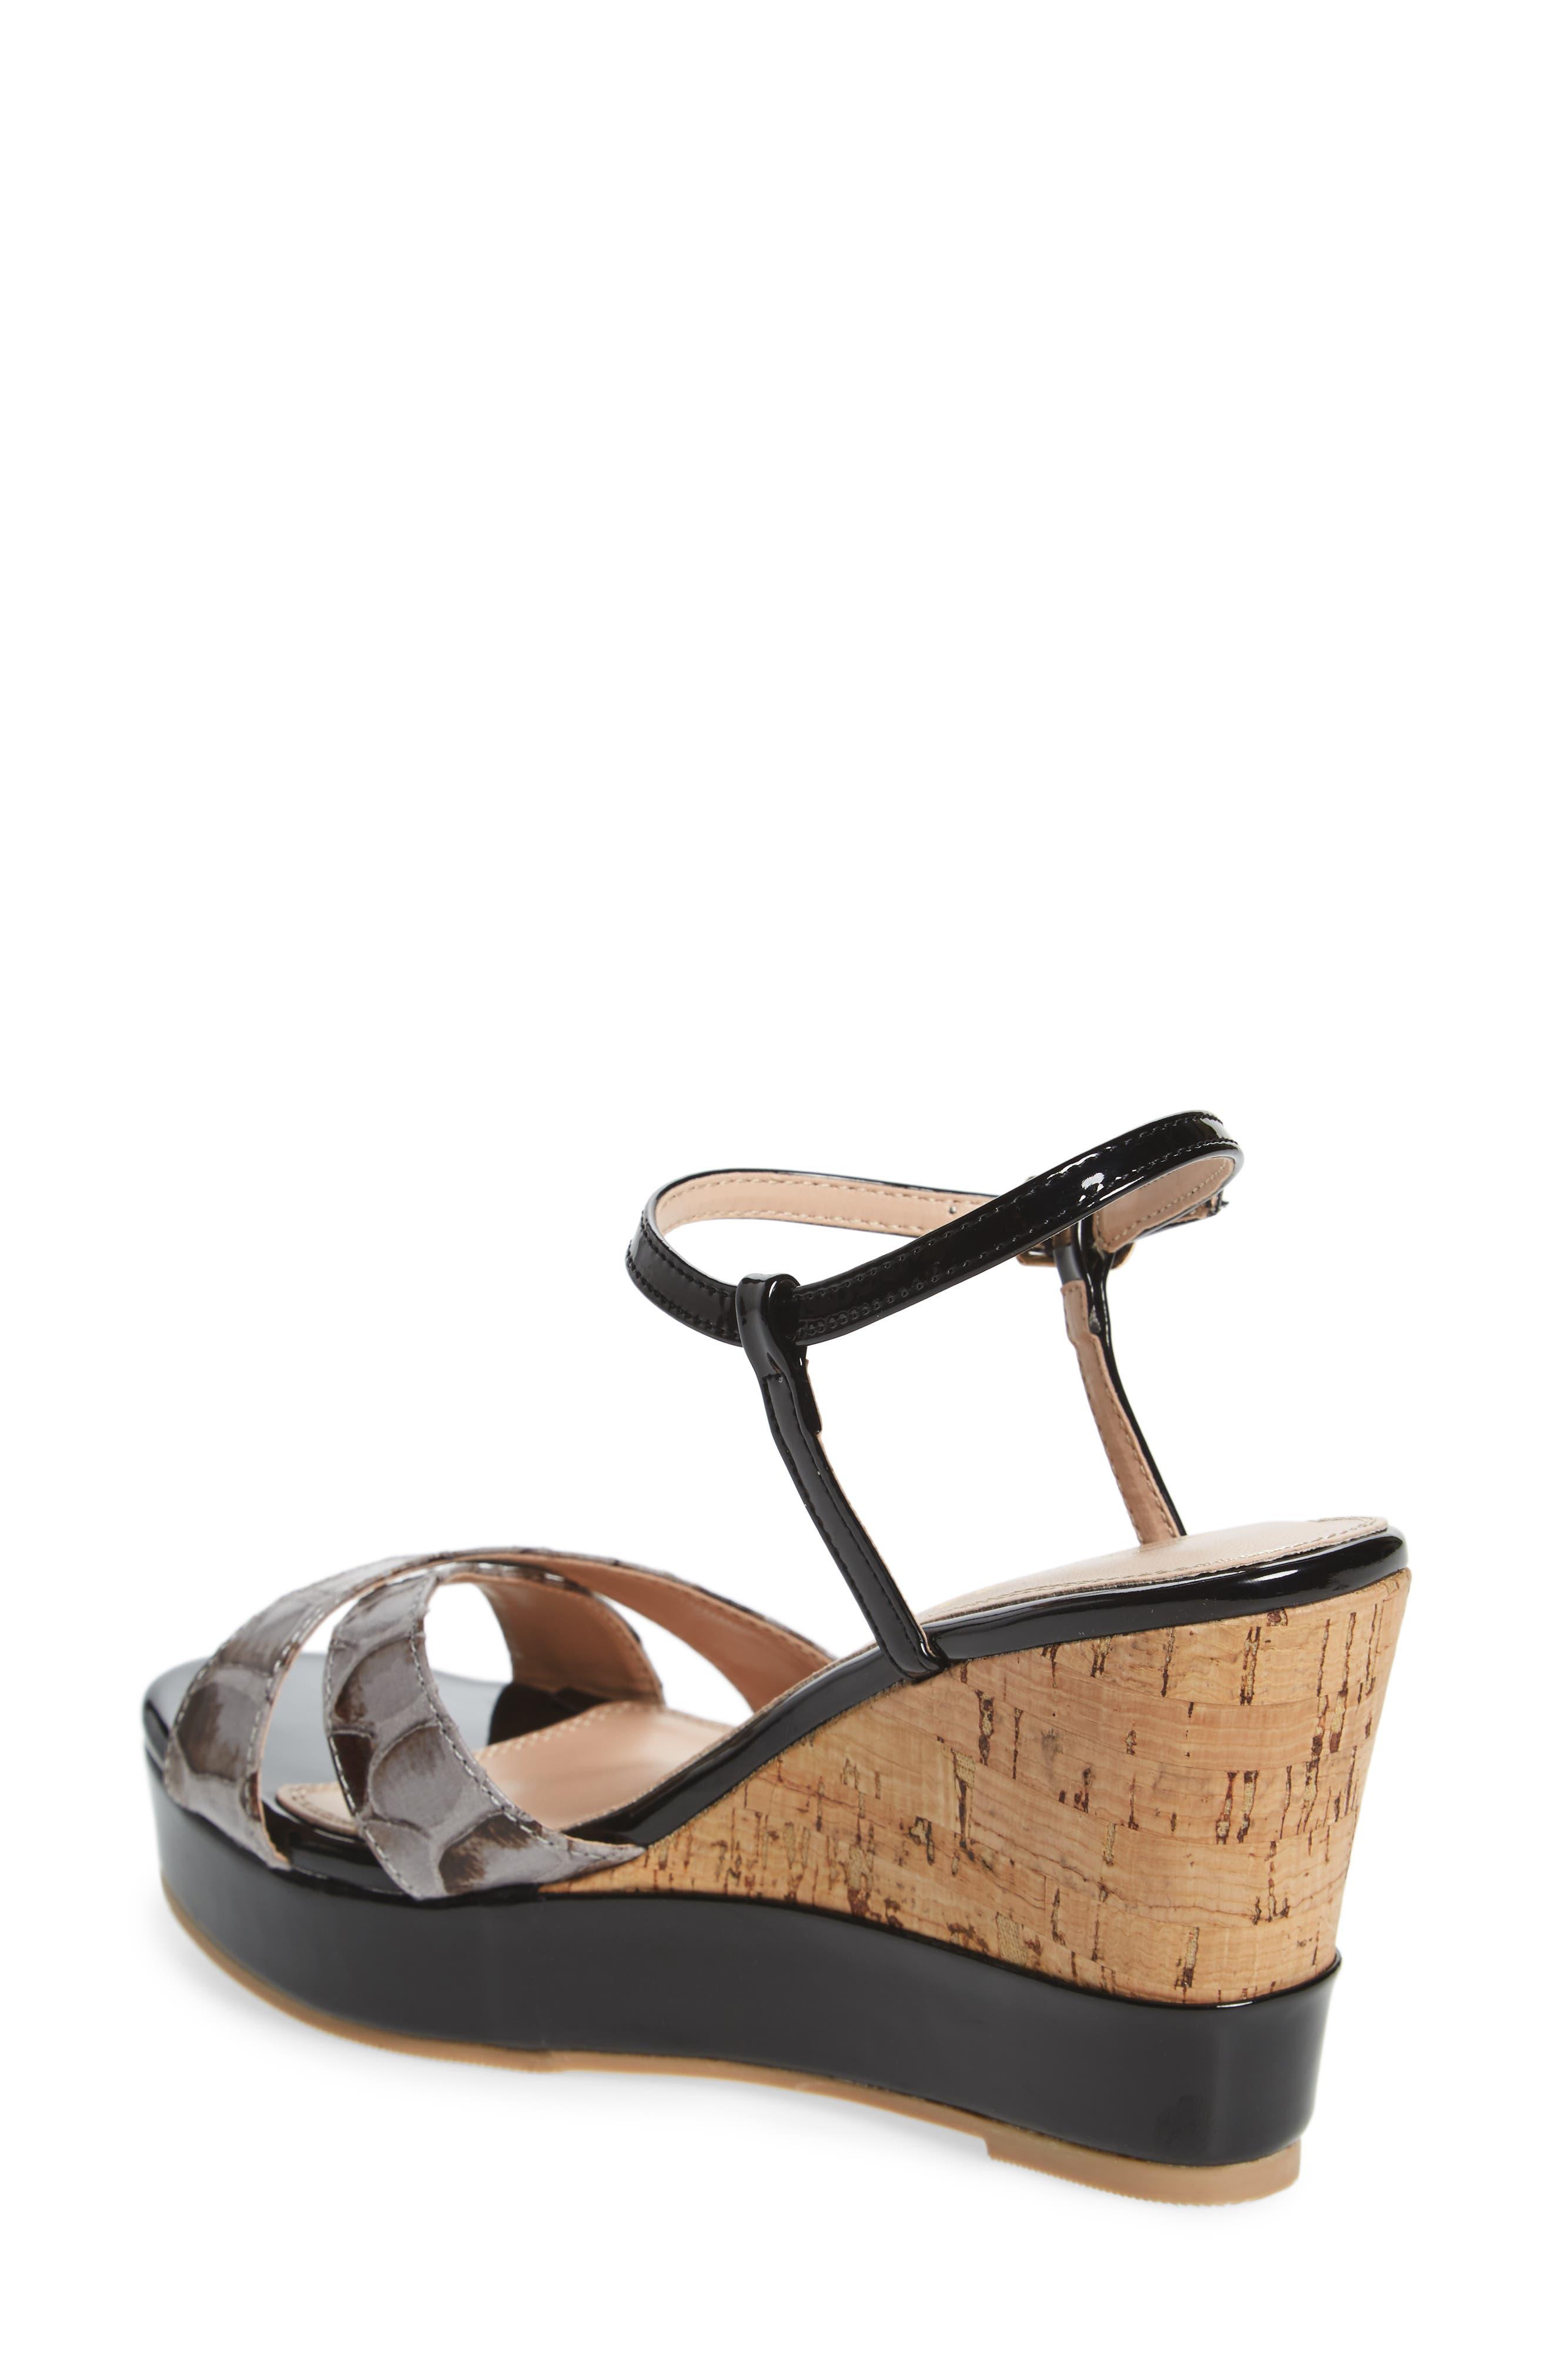 Lottie Platform Wedge Sandal,                             Alternate thumbnail 2, color,                             001